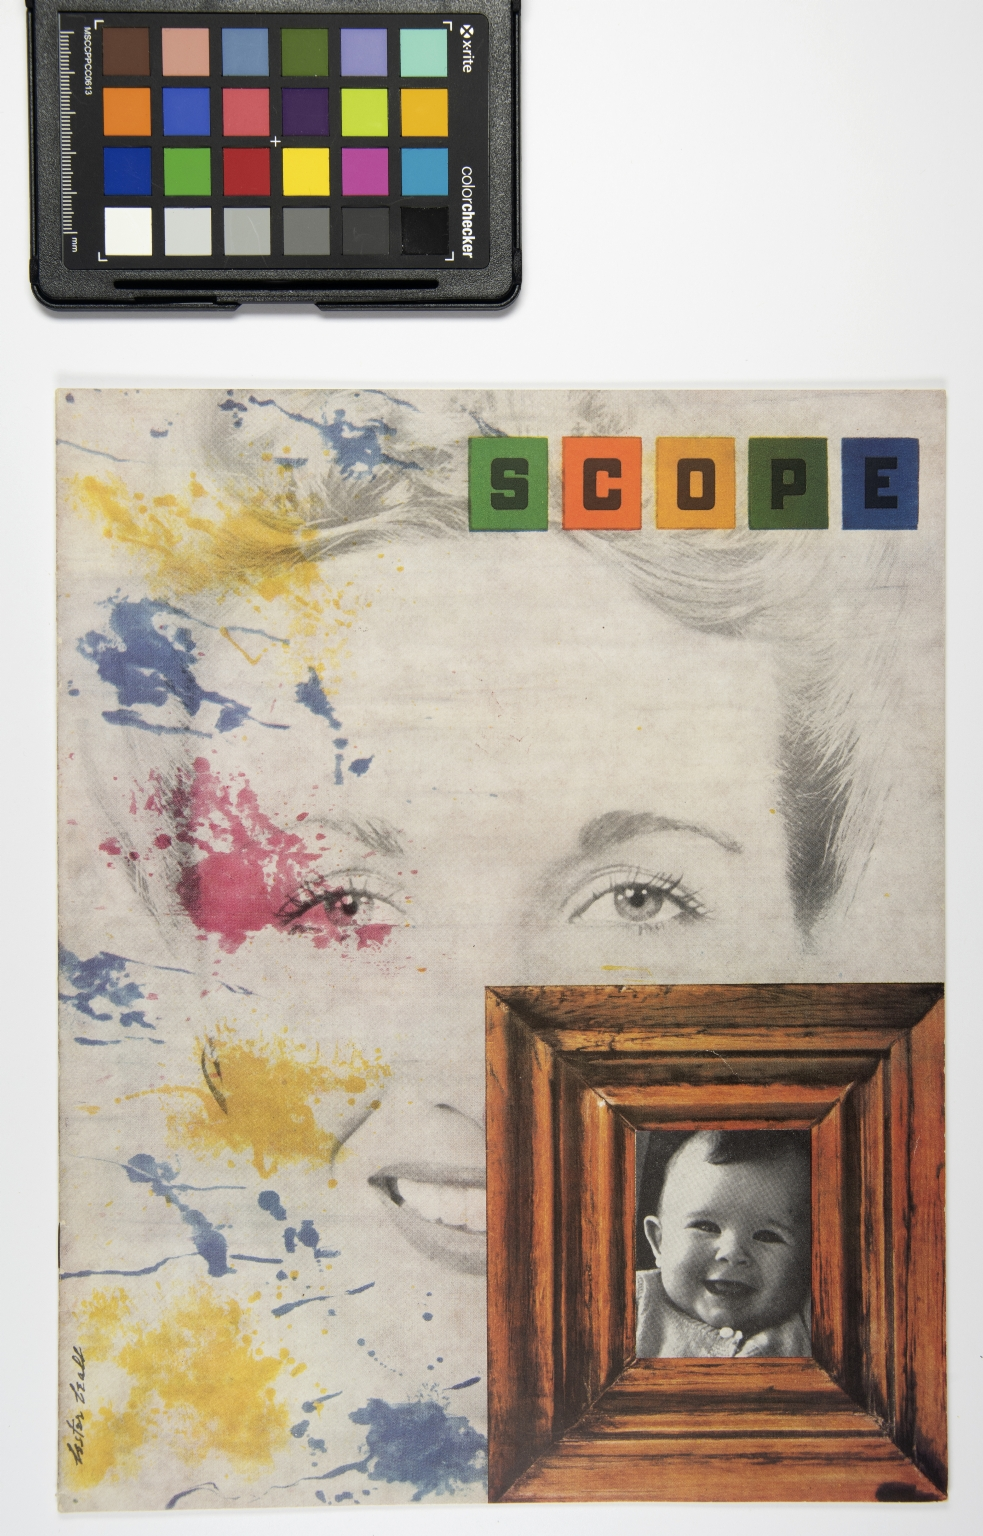 Scope, Volume II, Number 1